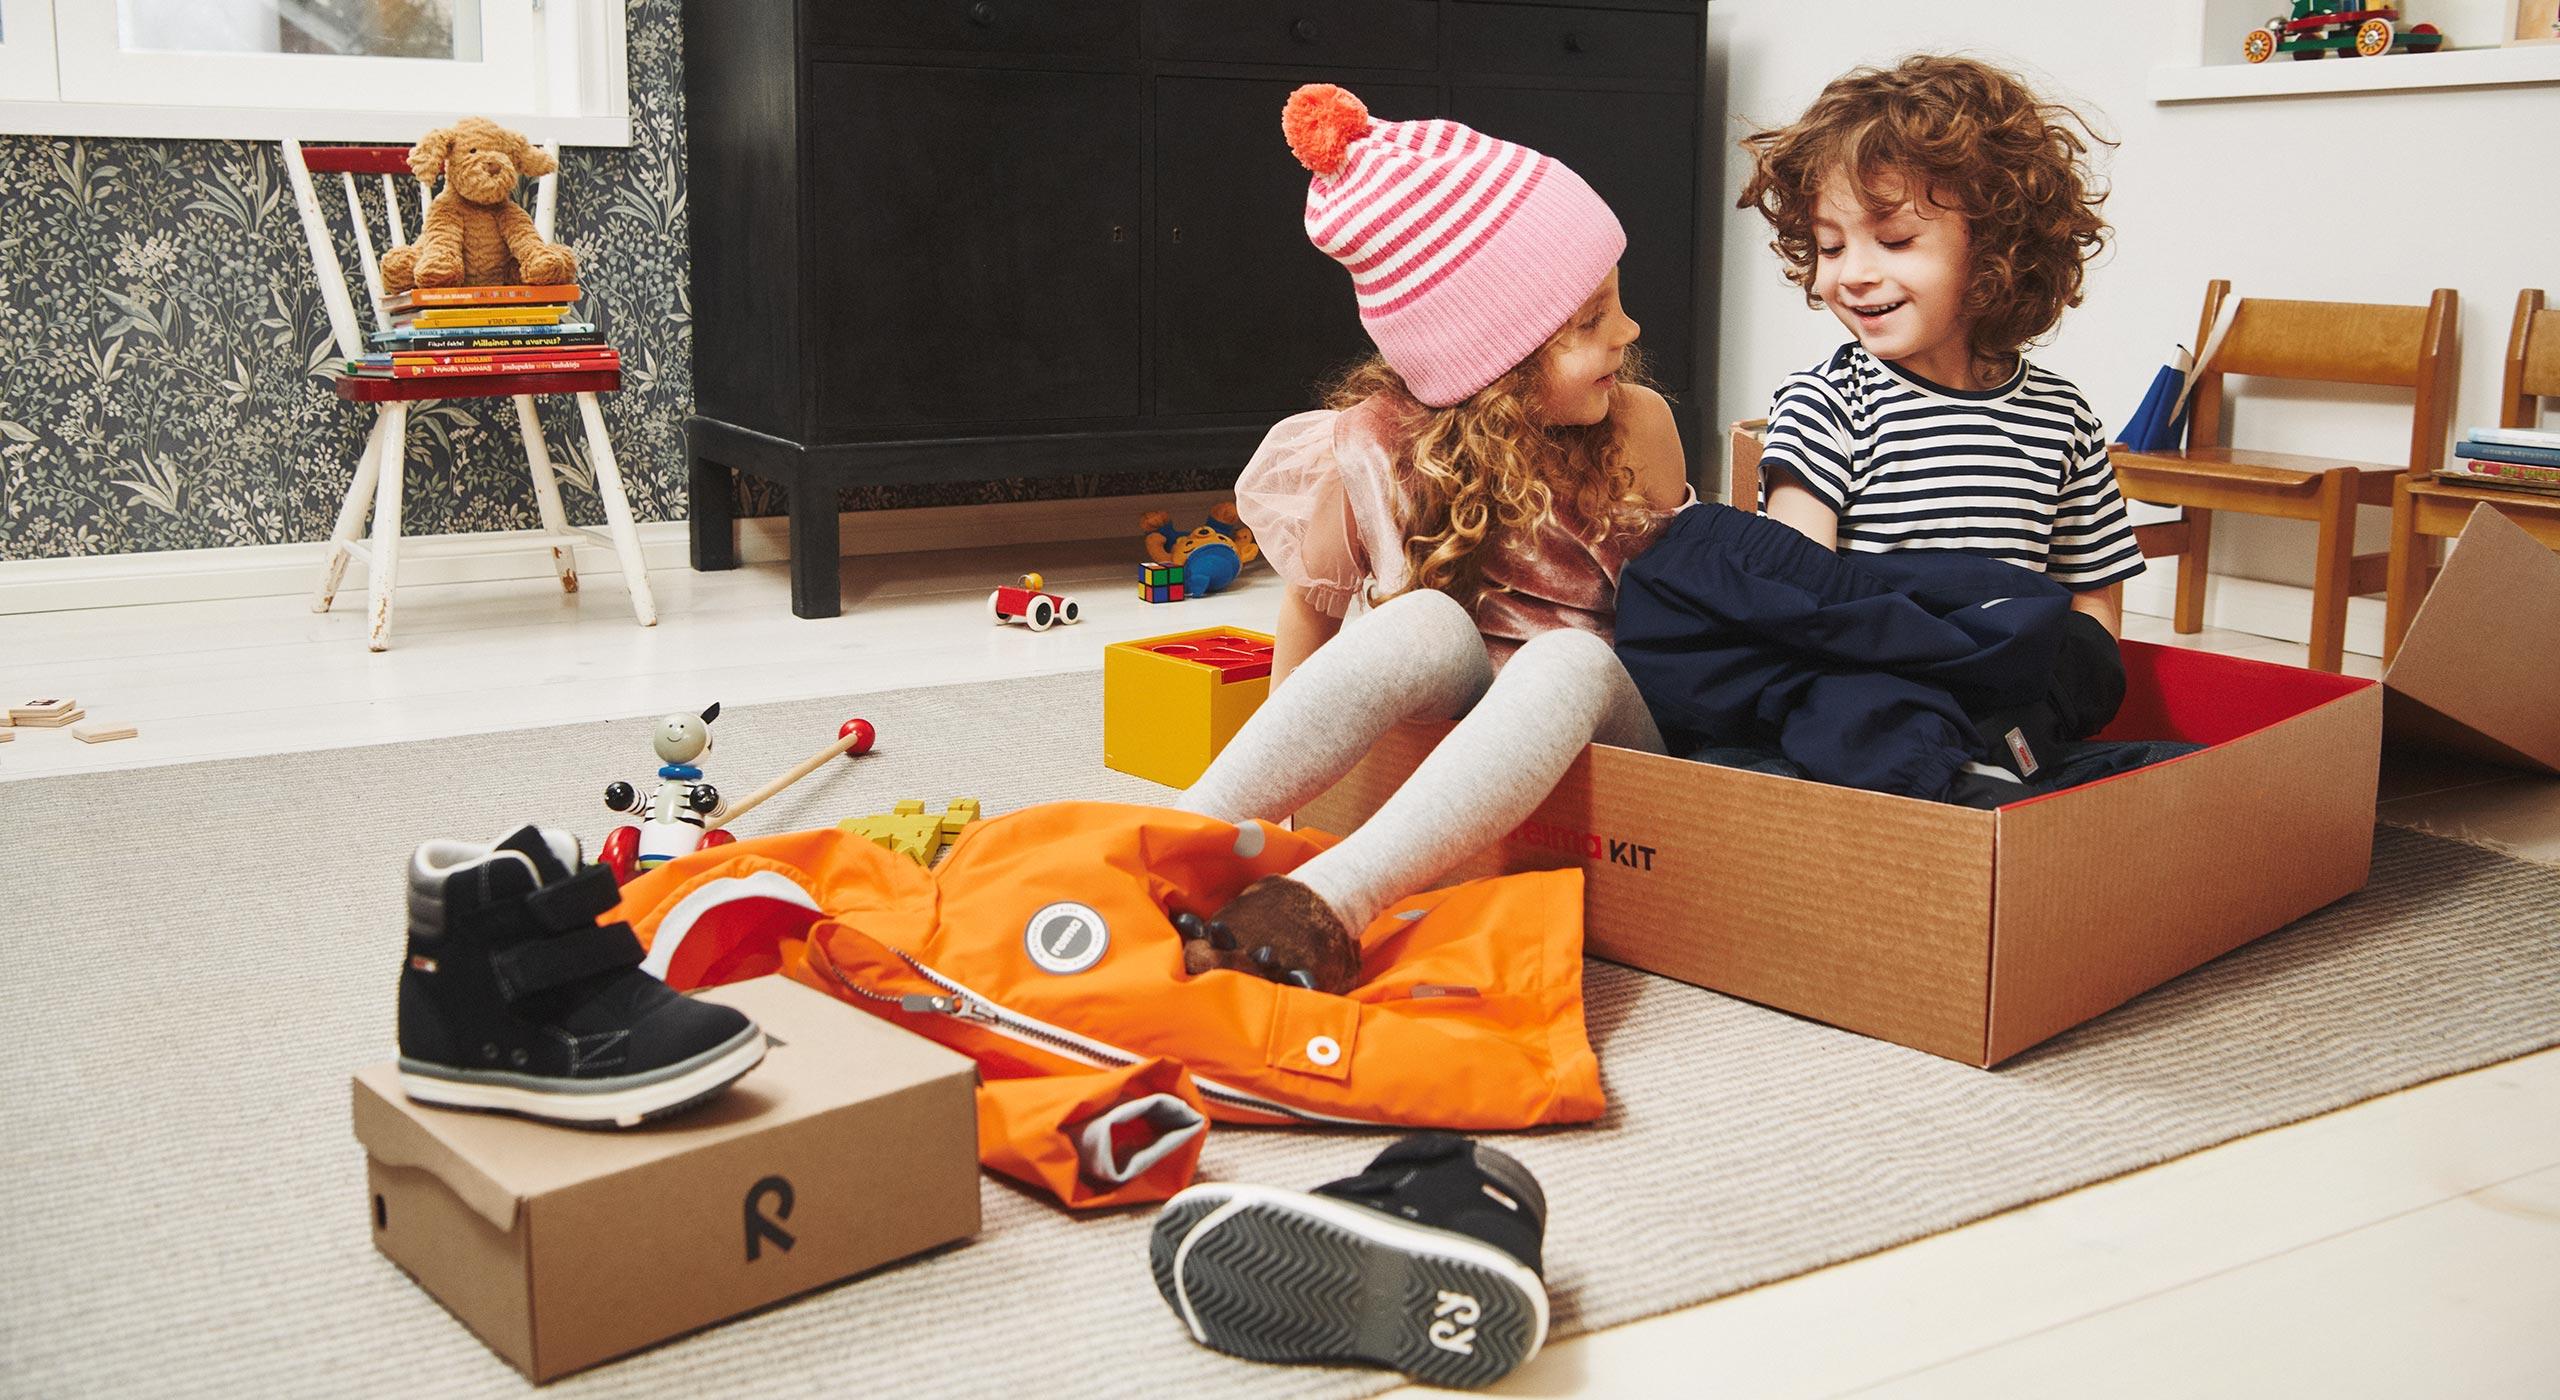 Kids playing with Reima Kit box